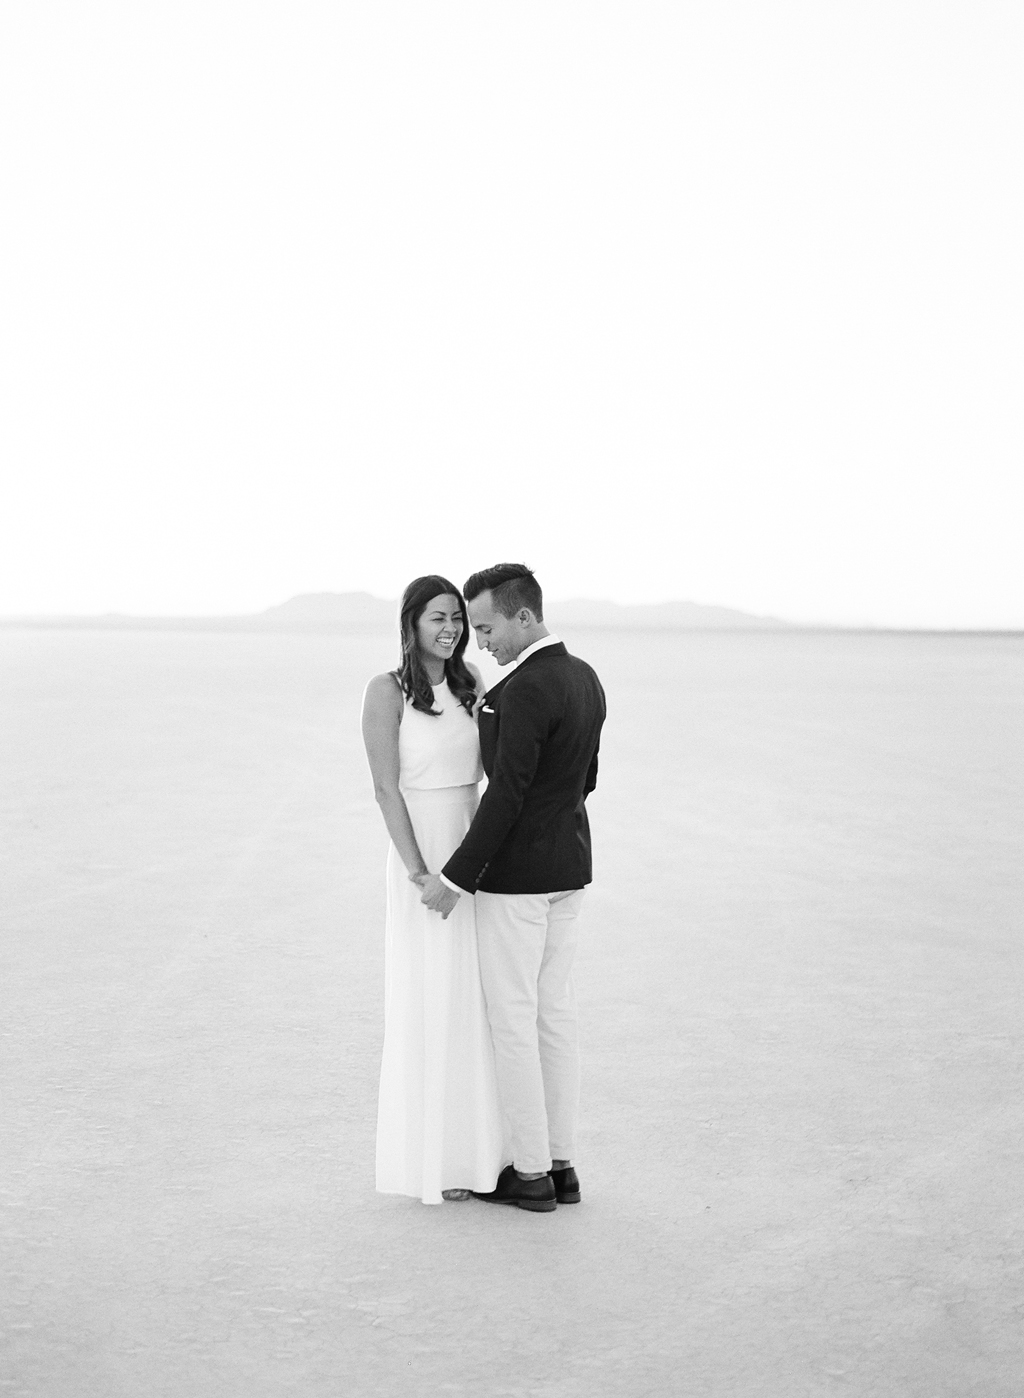 Desert_anniversary_9.jpg